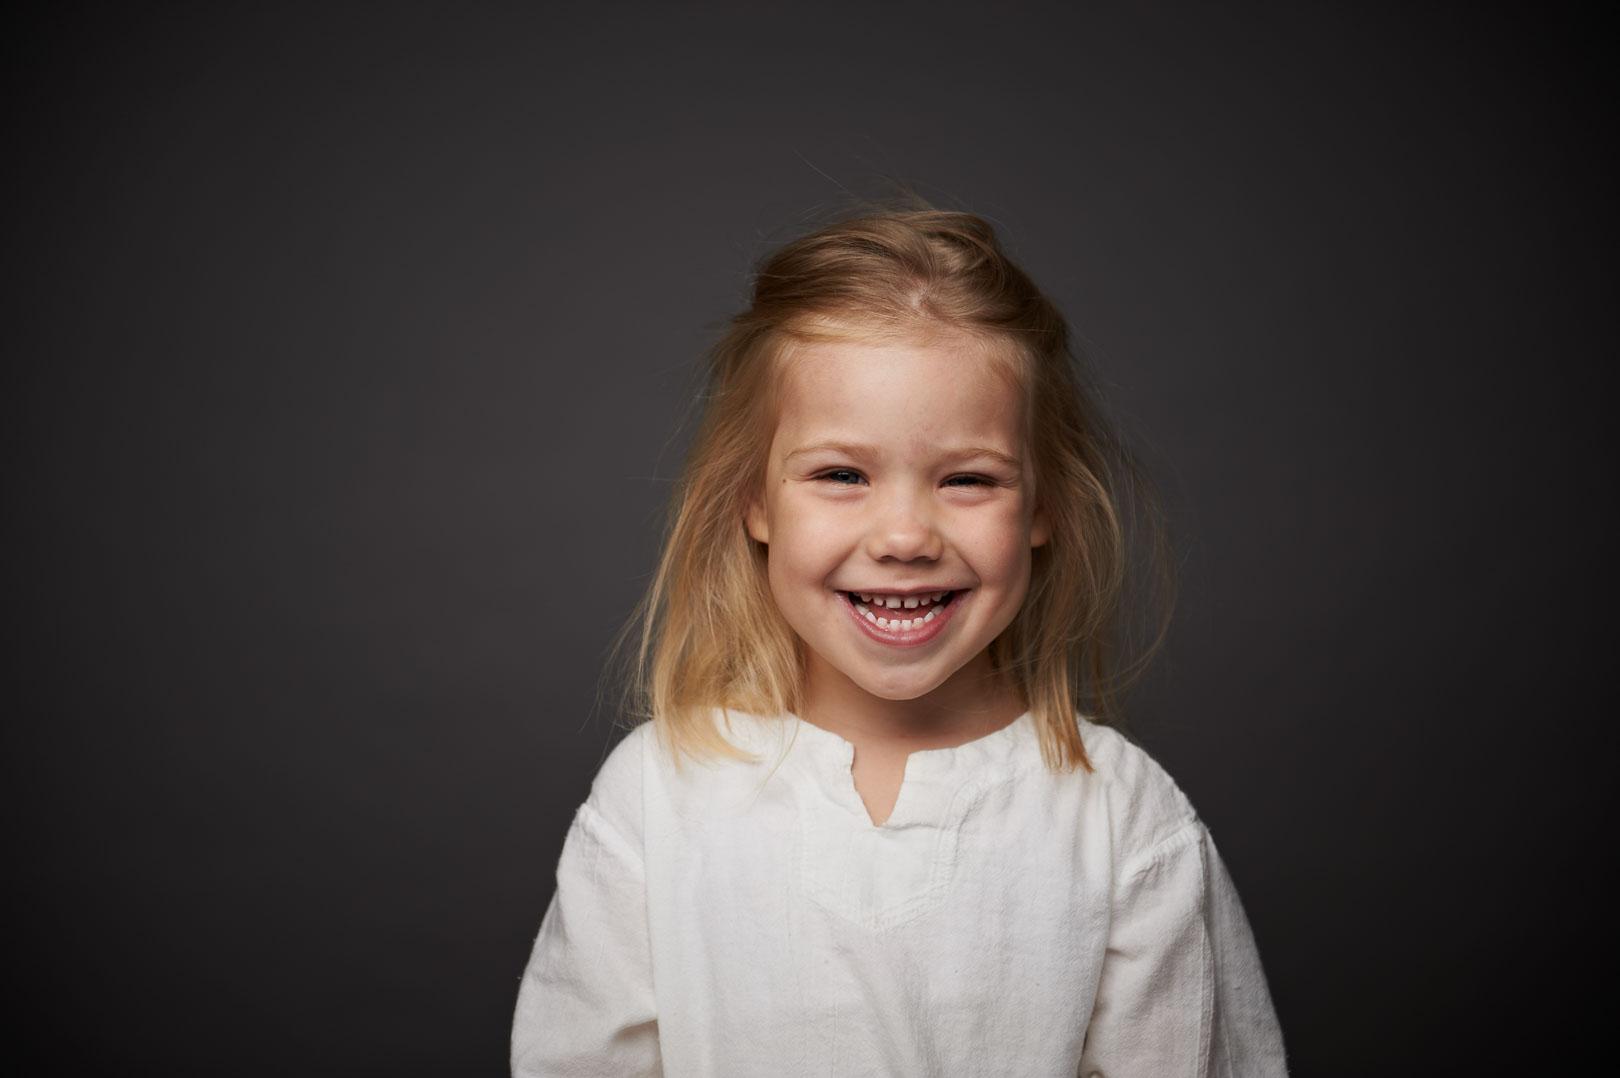 Gahlert Tochter 0731